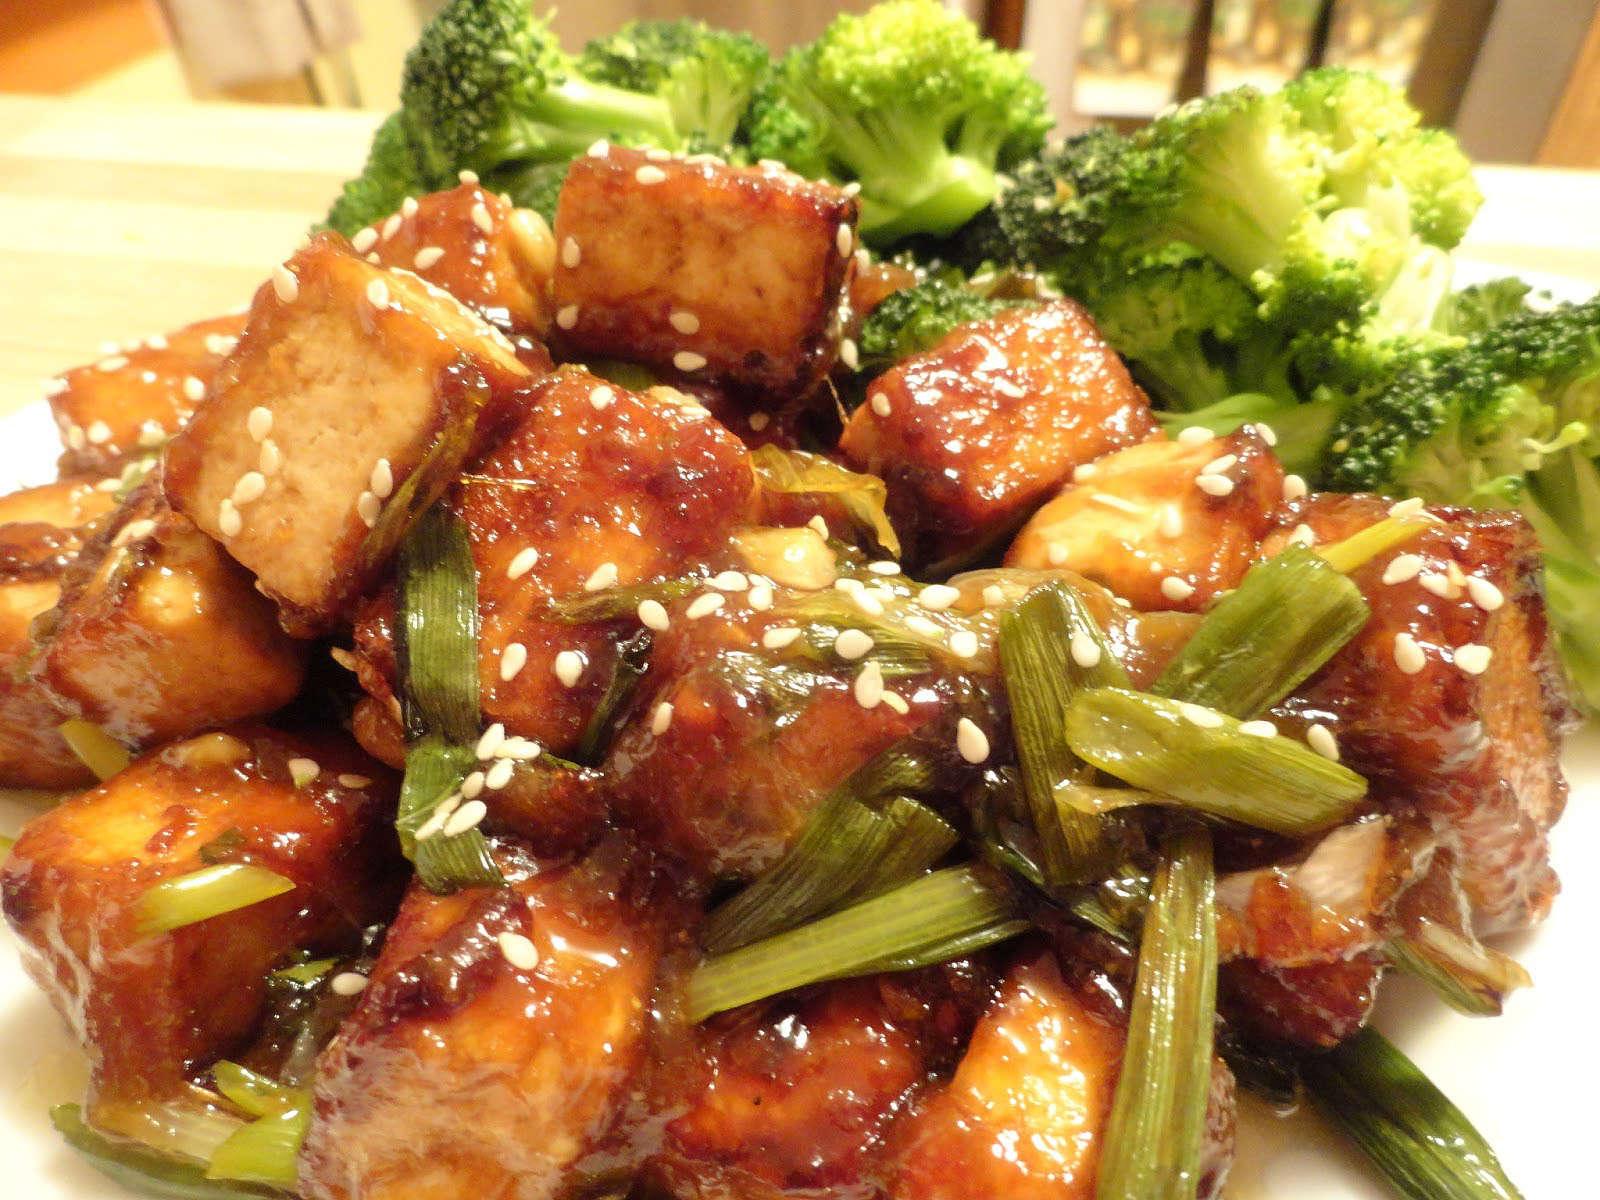 Vegan Chinese Food Choices